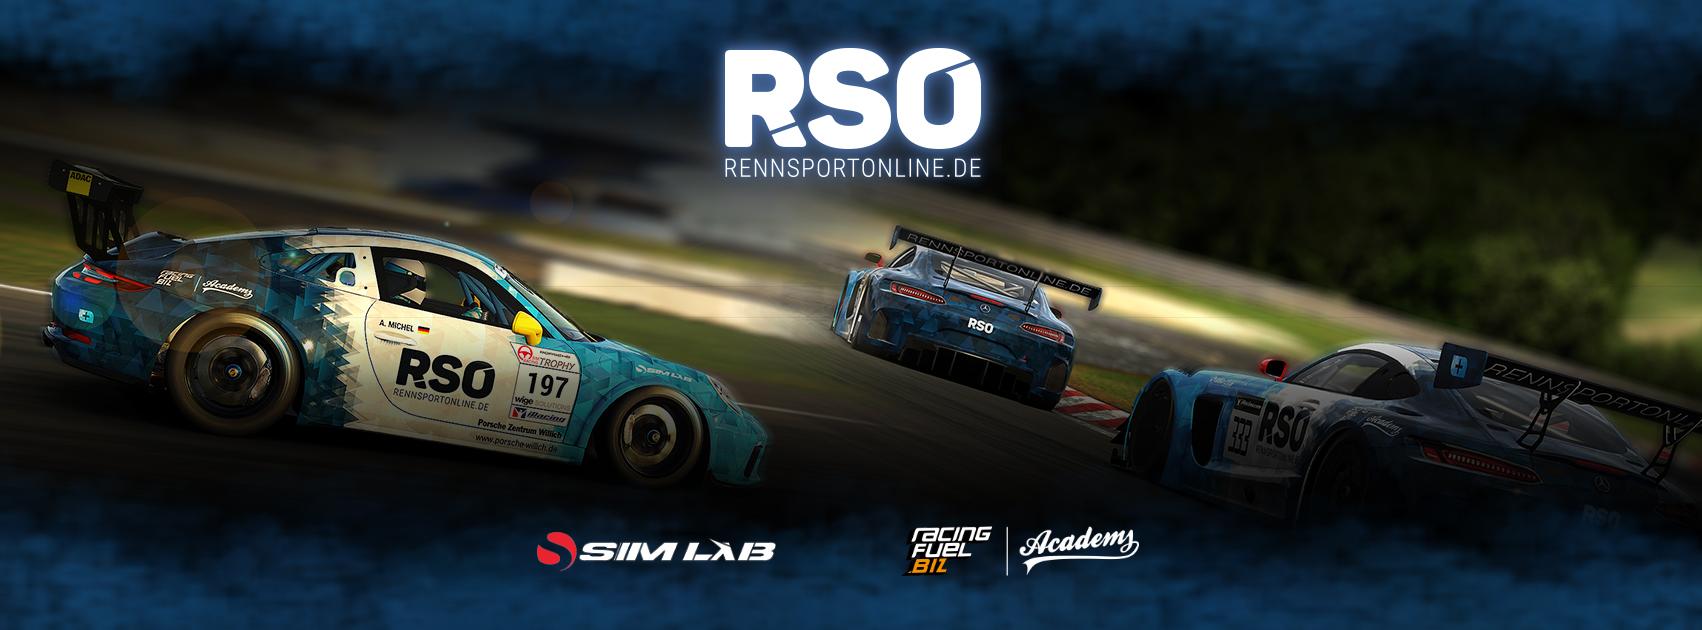 Team RSO